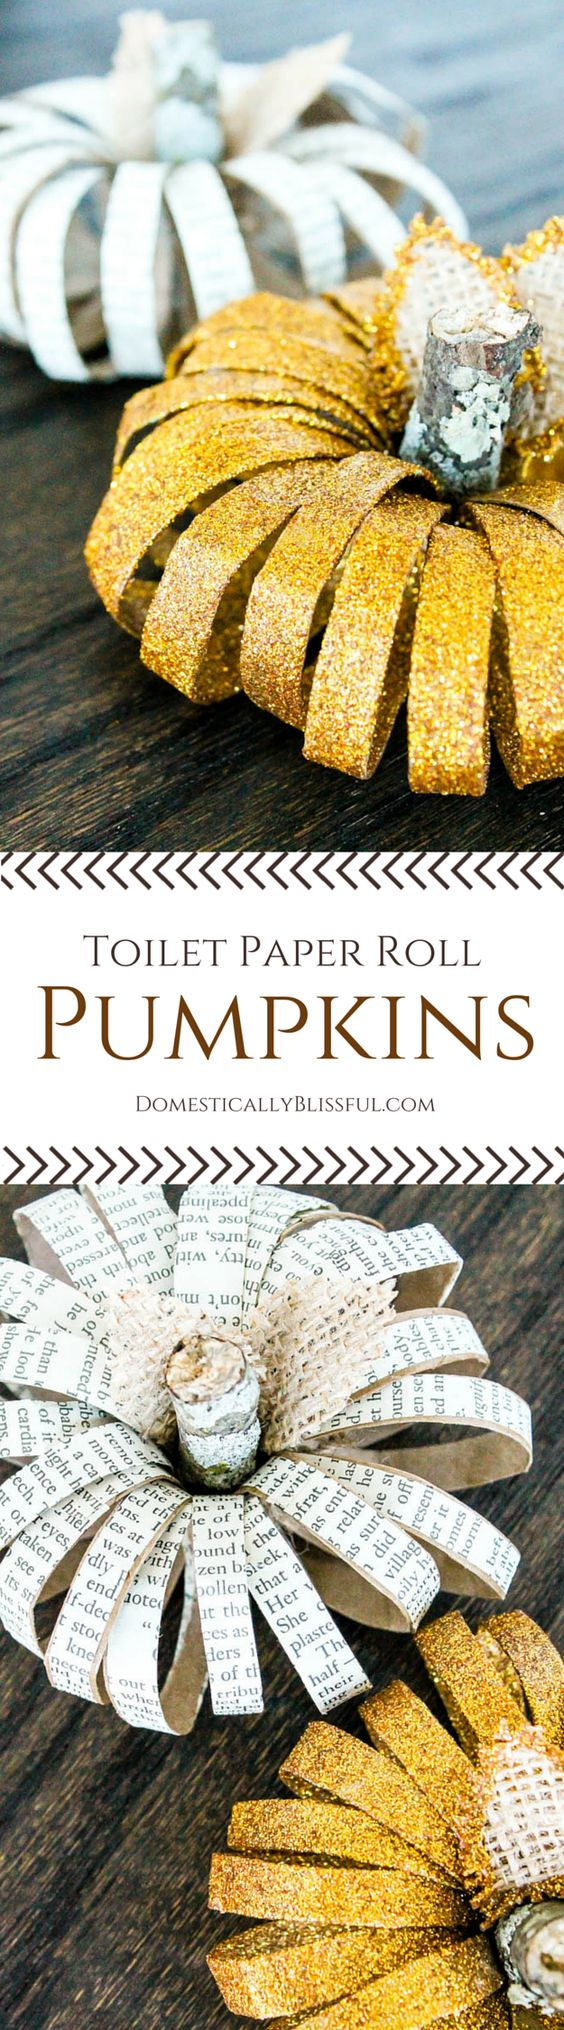 DIY Toilet Paper Roll Pumpkins | http://domesticallyblissful.com/diy-toilet-paper-roll-pumpkins/